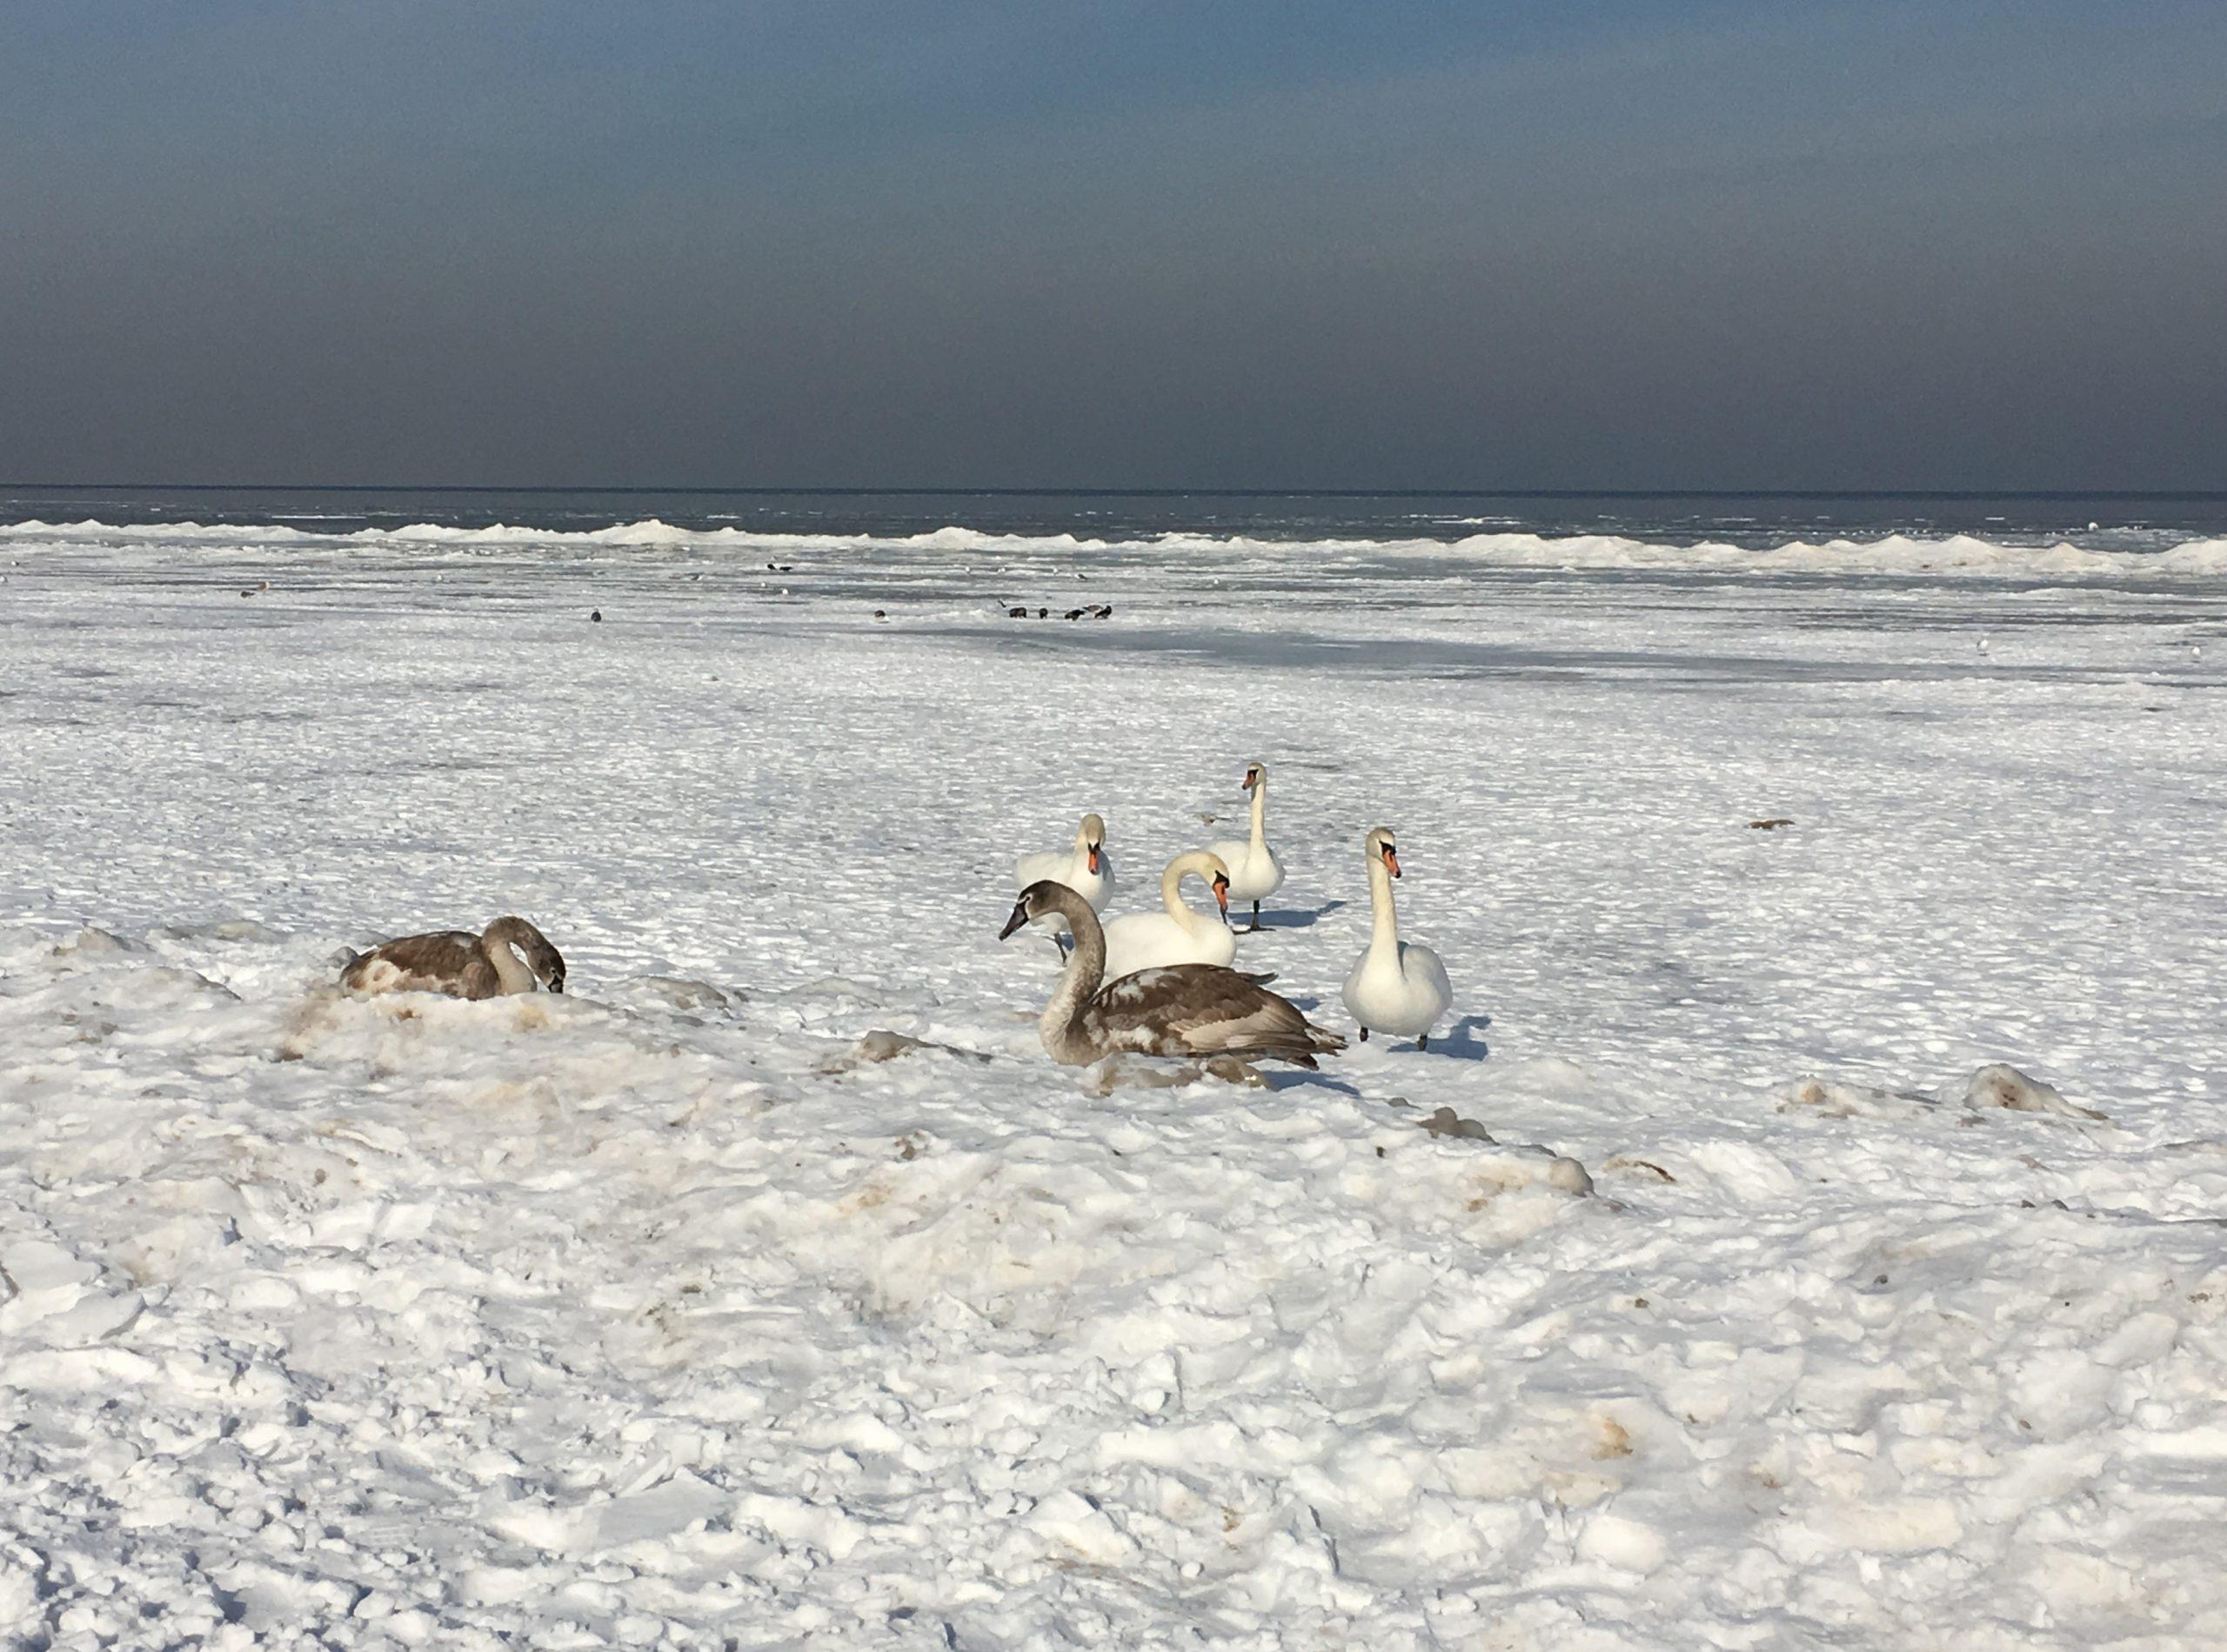 Юрмала море лебеди зима пейзажи природы Альберт Сафиуллин